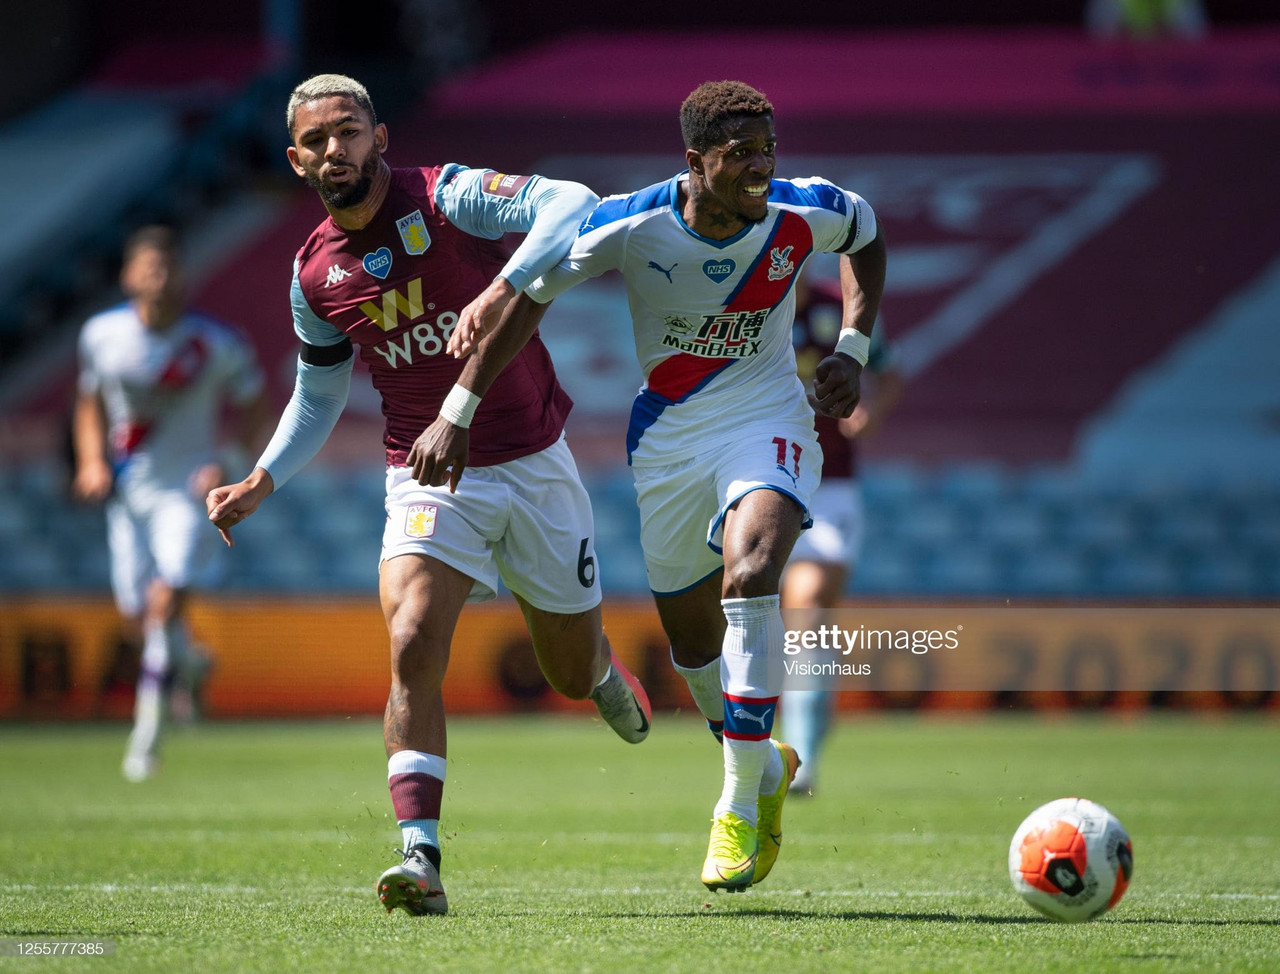 As it happened: Aston Villa 3-0 Crystal Palace